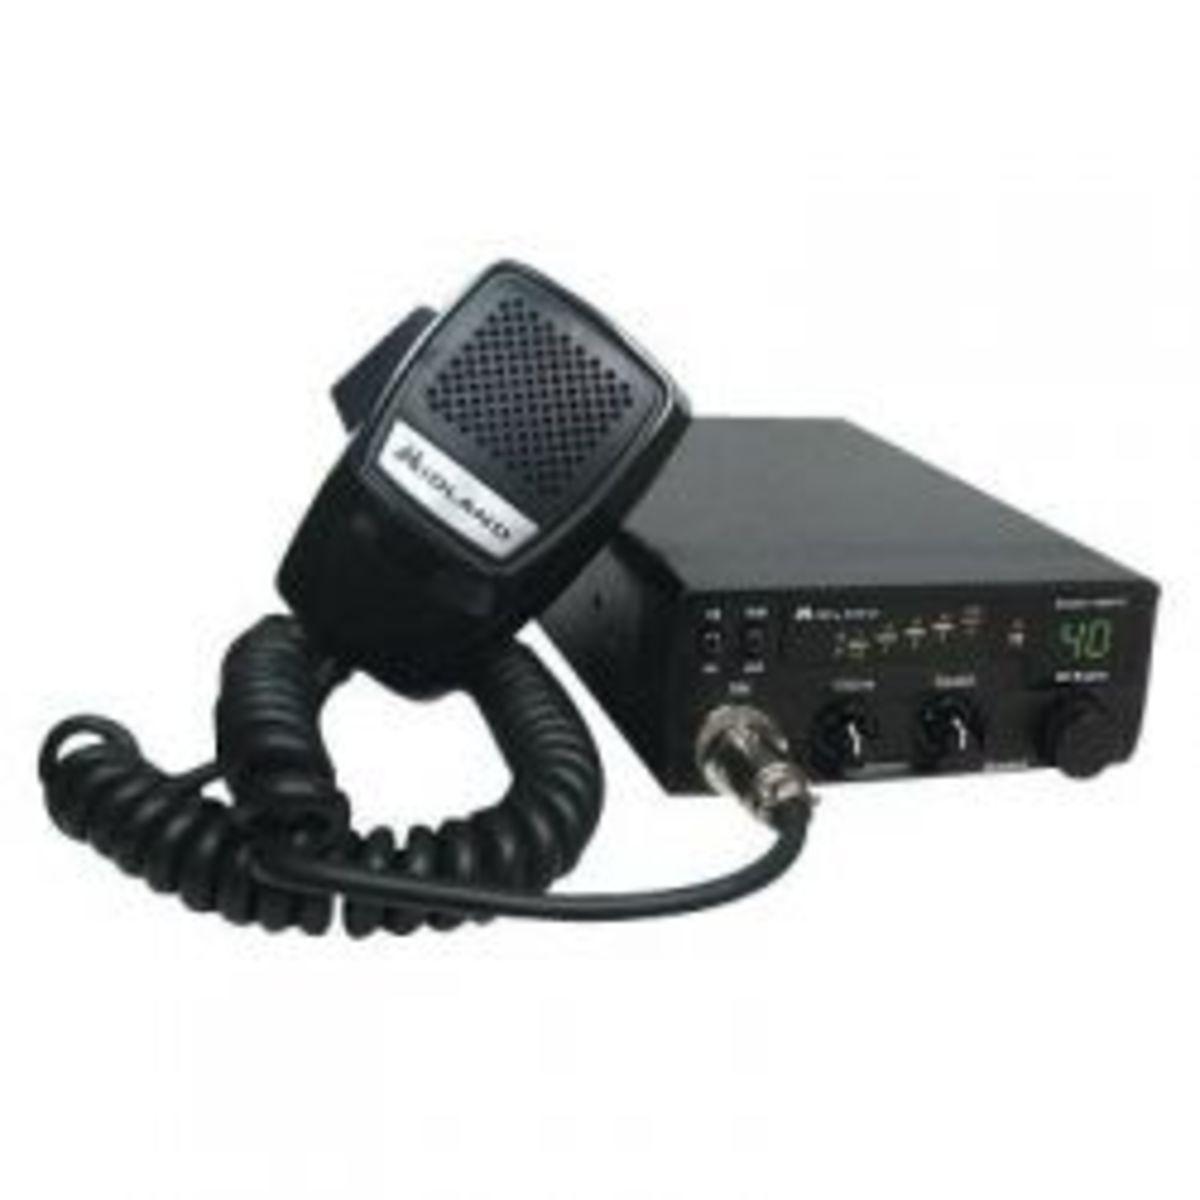 cb-radio-and-ham-radio